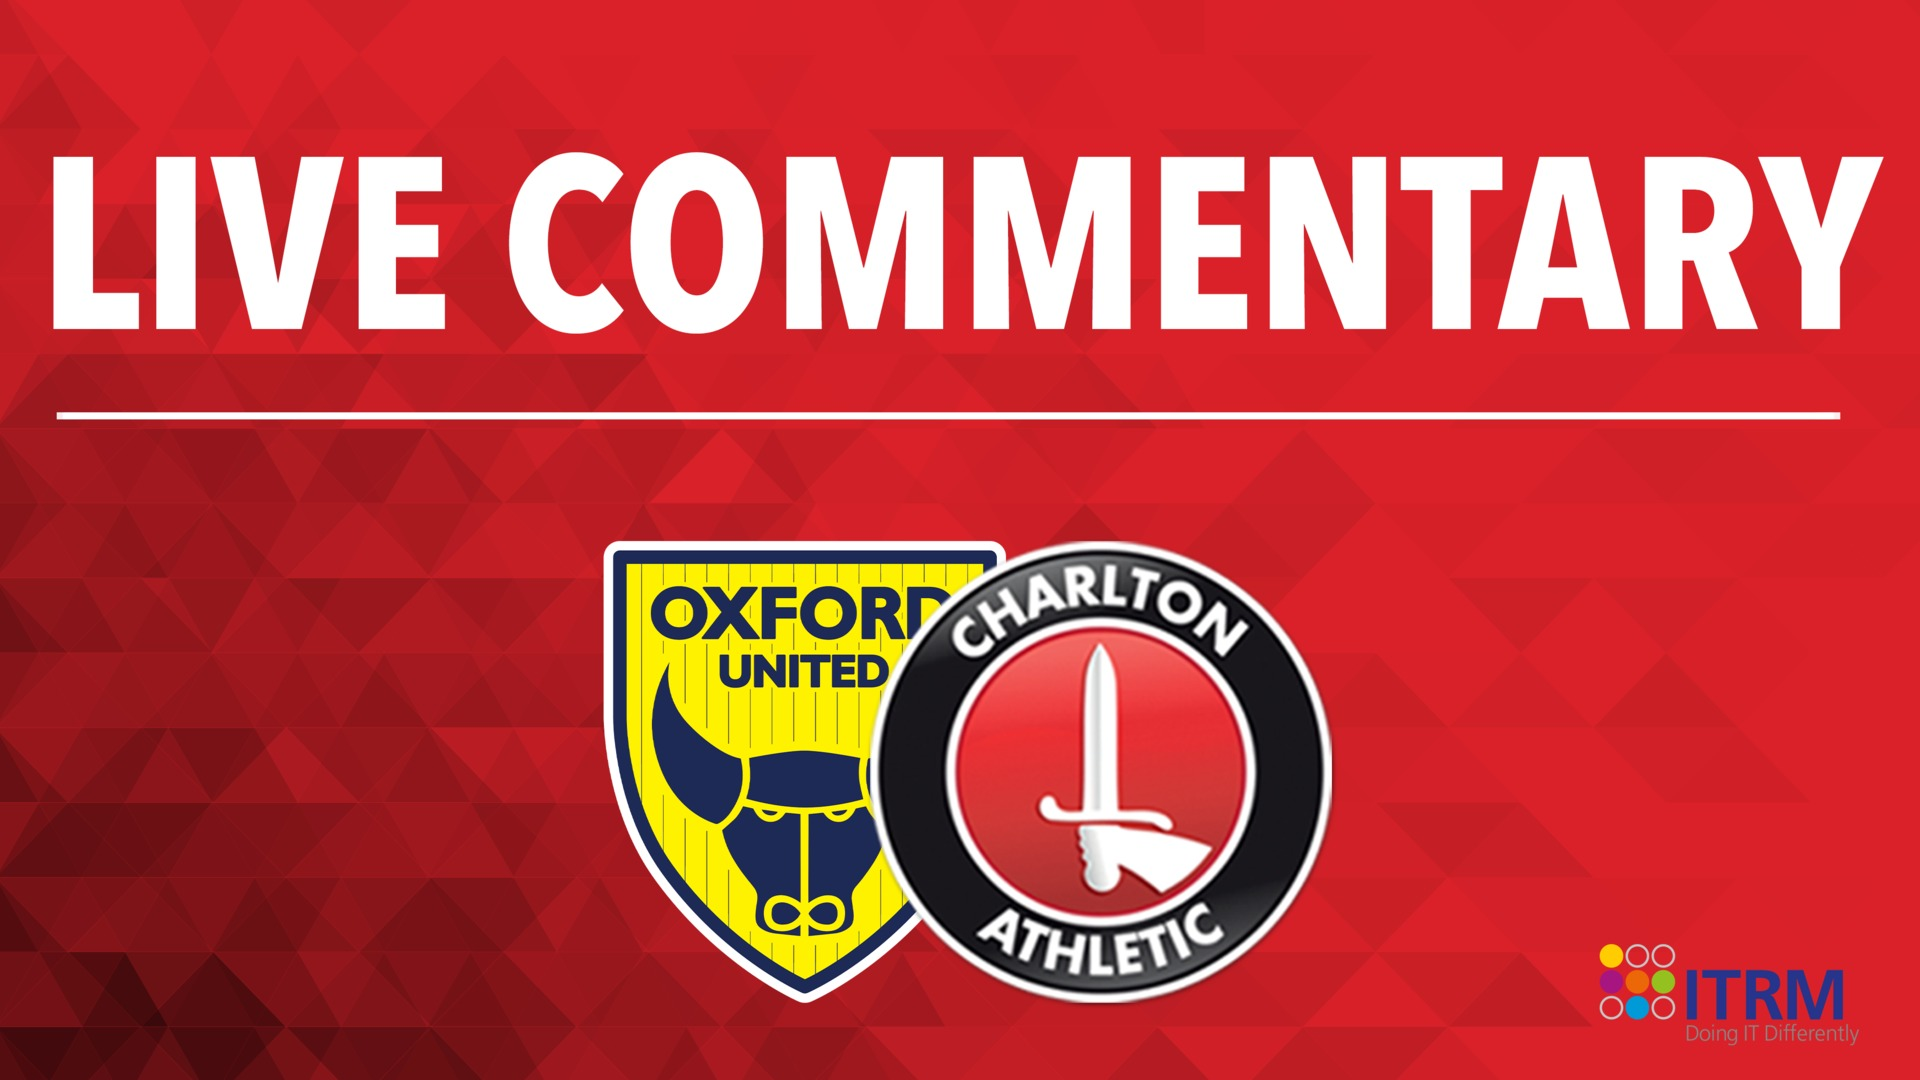 LIVE COMMENTARY | Oxford United v Charlton